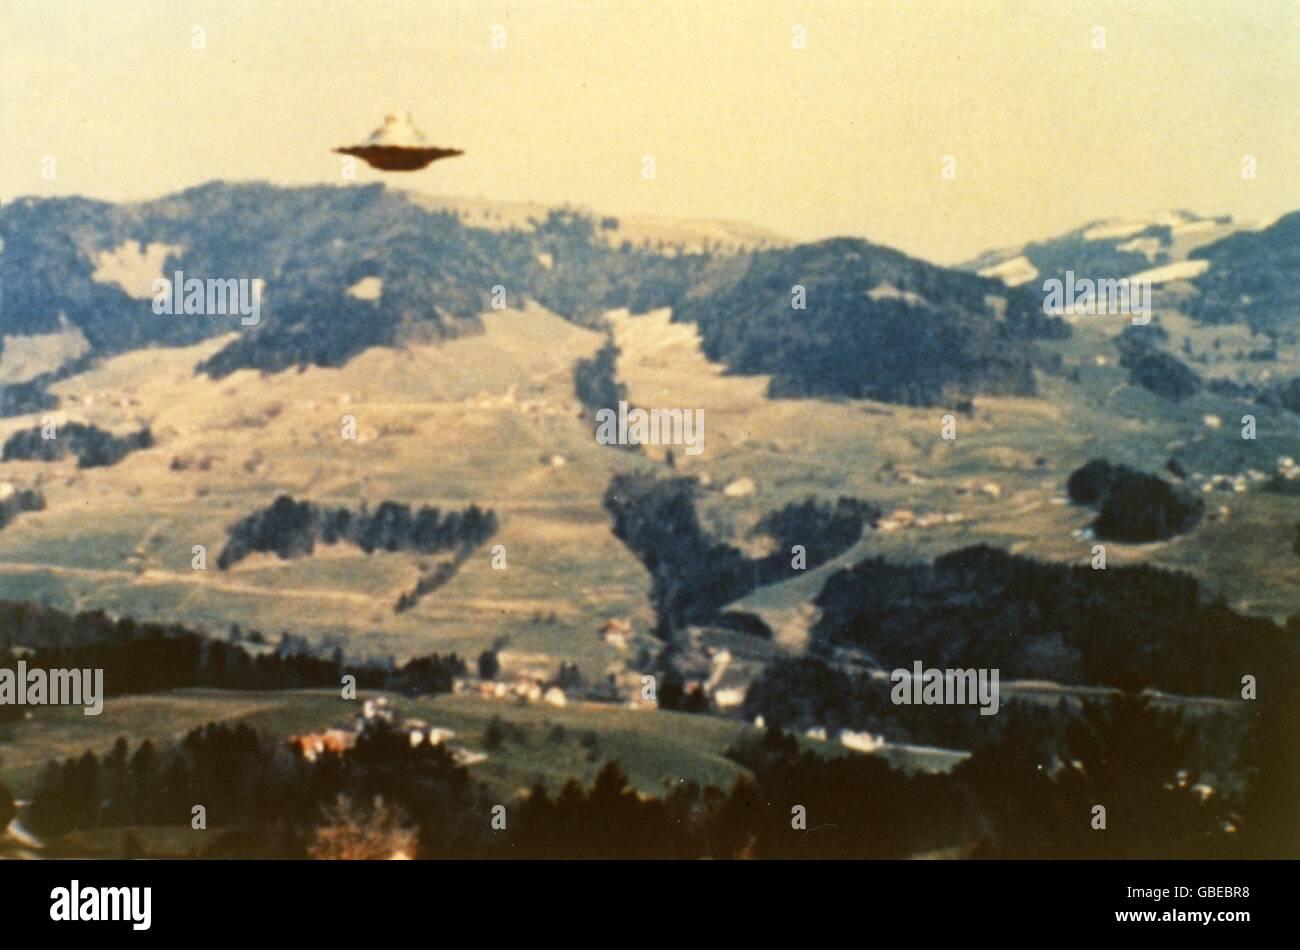 astronautics, unidentified flying object (UFO), ufos, show flight of Semiases ship, Bachtelhörnli-Unterbachtel, - Stock Image